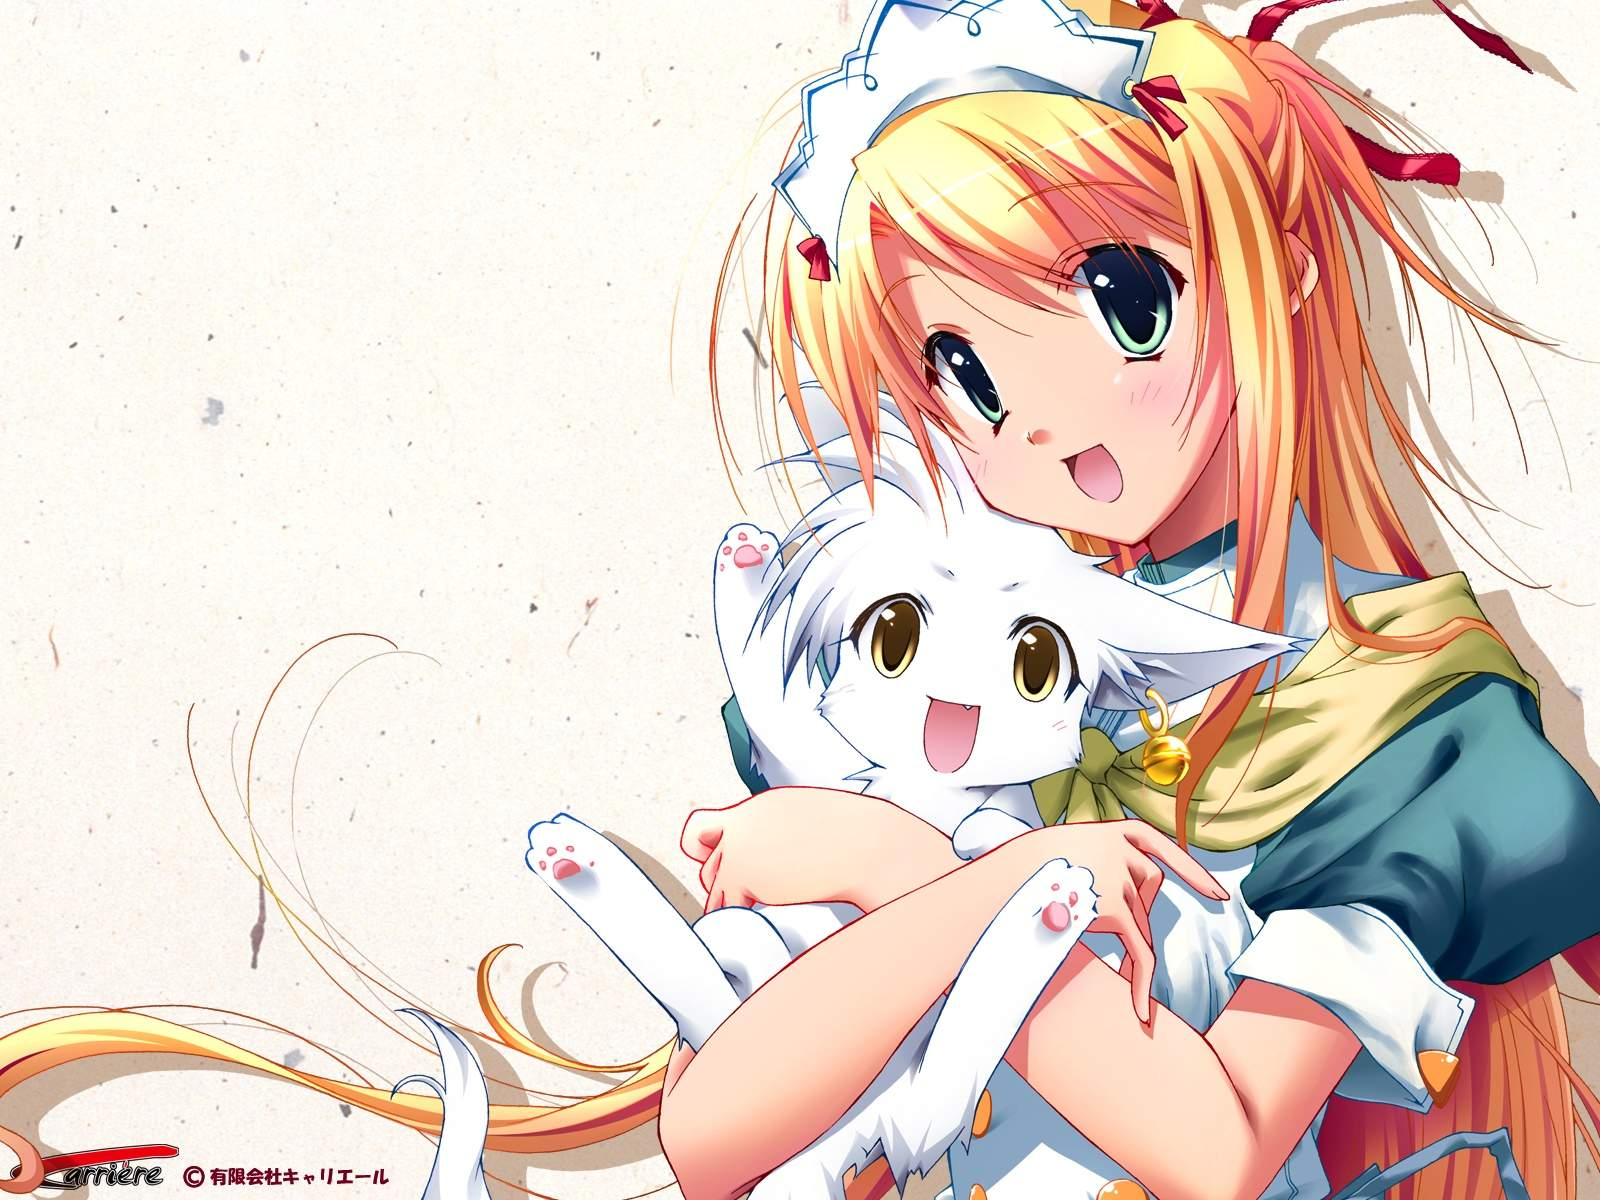 cute anime wallpapers free download wallpaper dawallpaperz